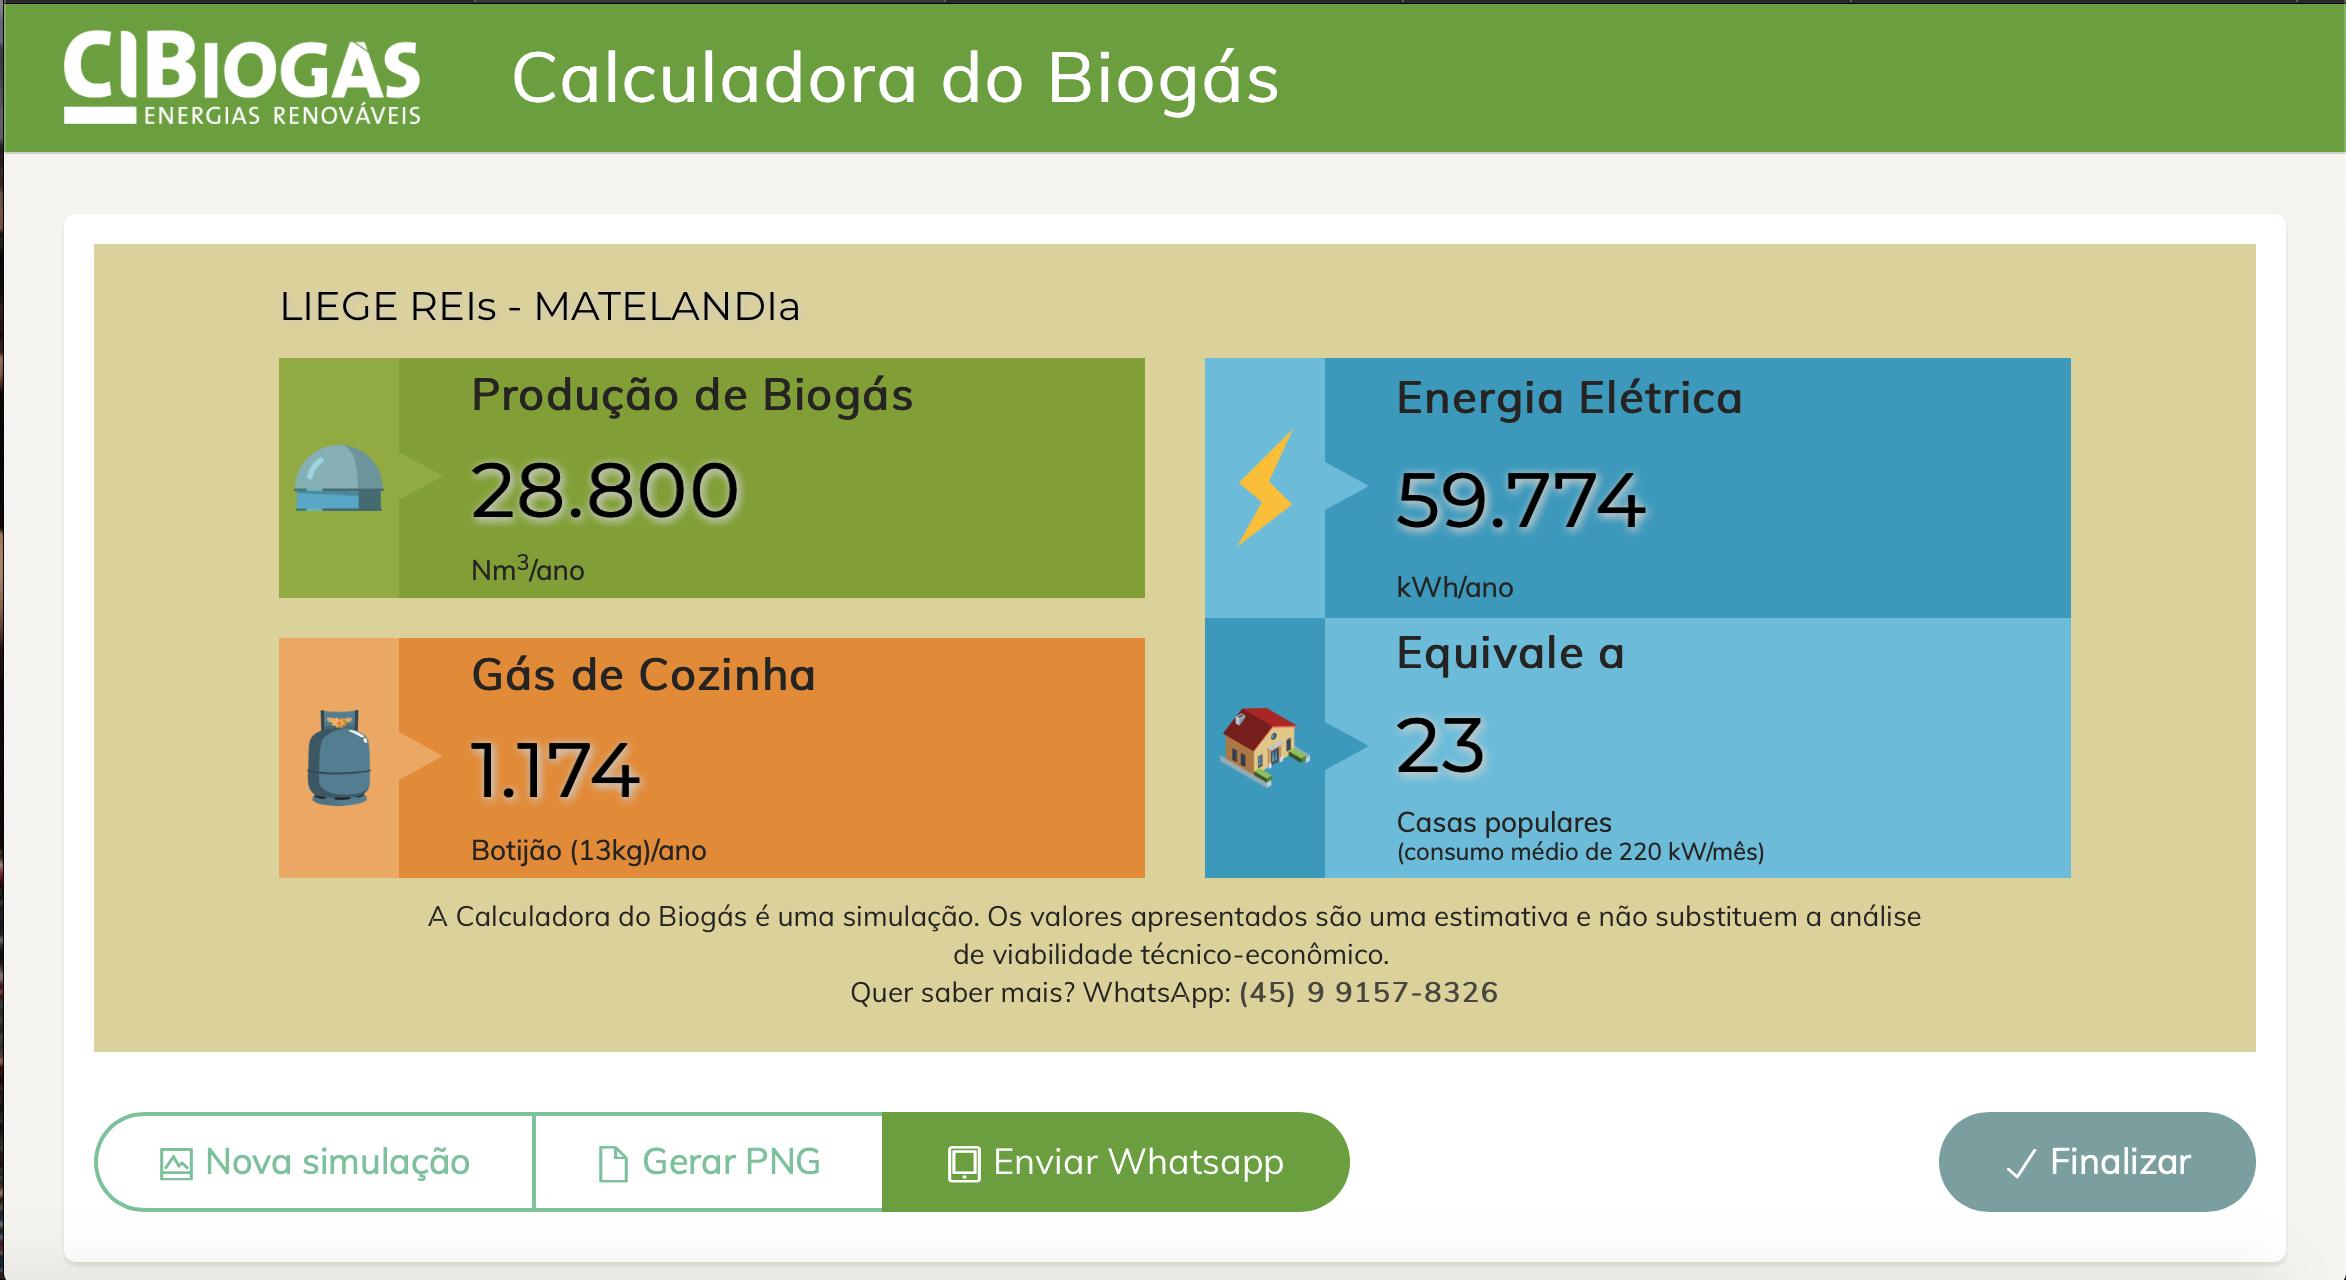 resultado de cálculos realizados pela Calculadora de Biogás do CIBiogás lançamento Show Rural Coopavel